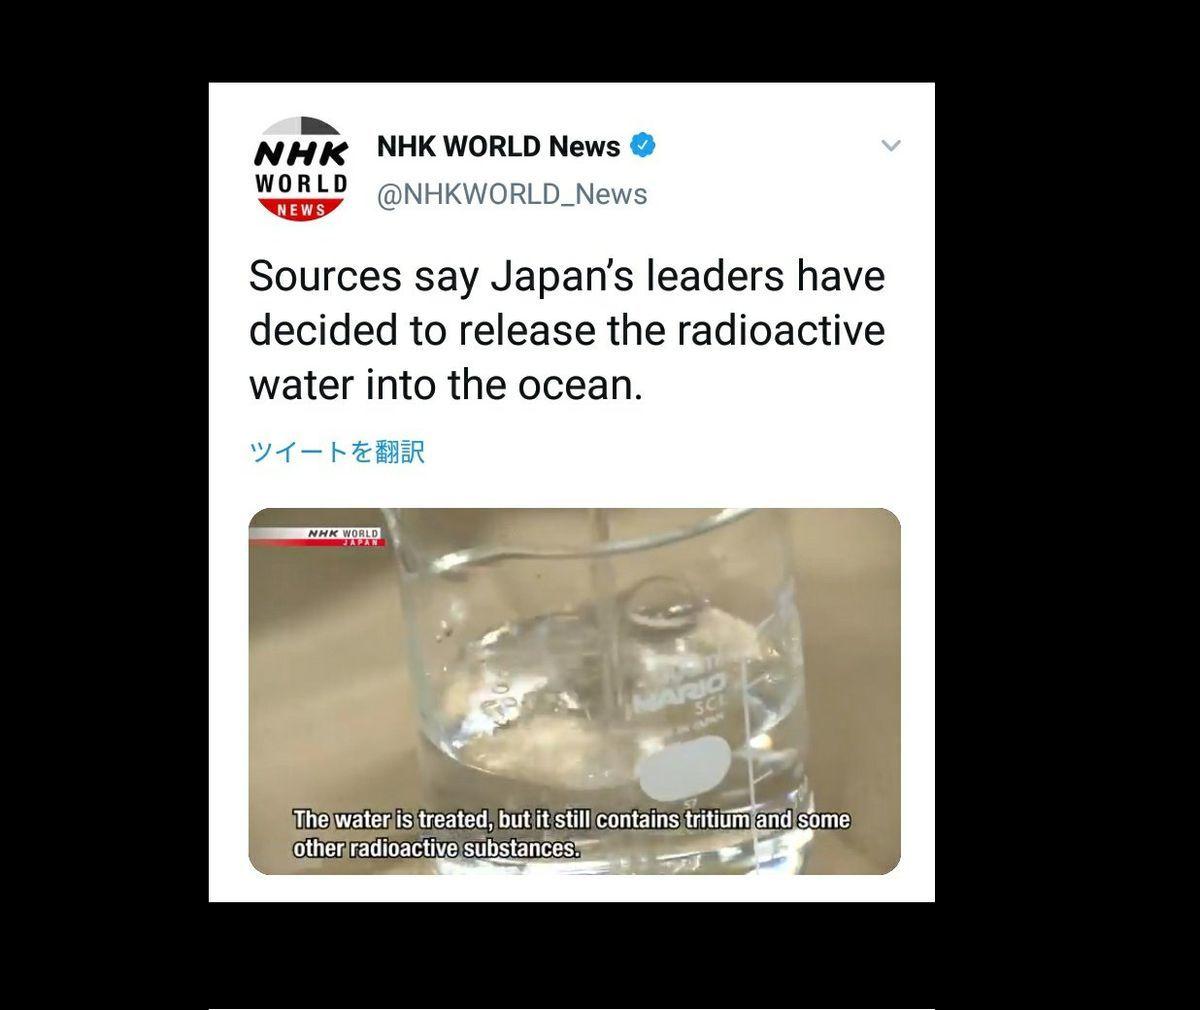 NHKワールドニュースの放射性汚染水放出報道